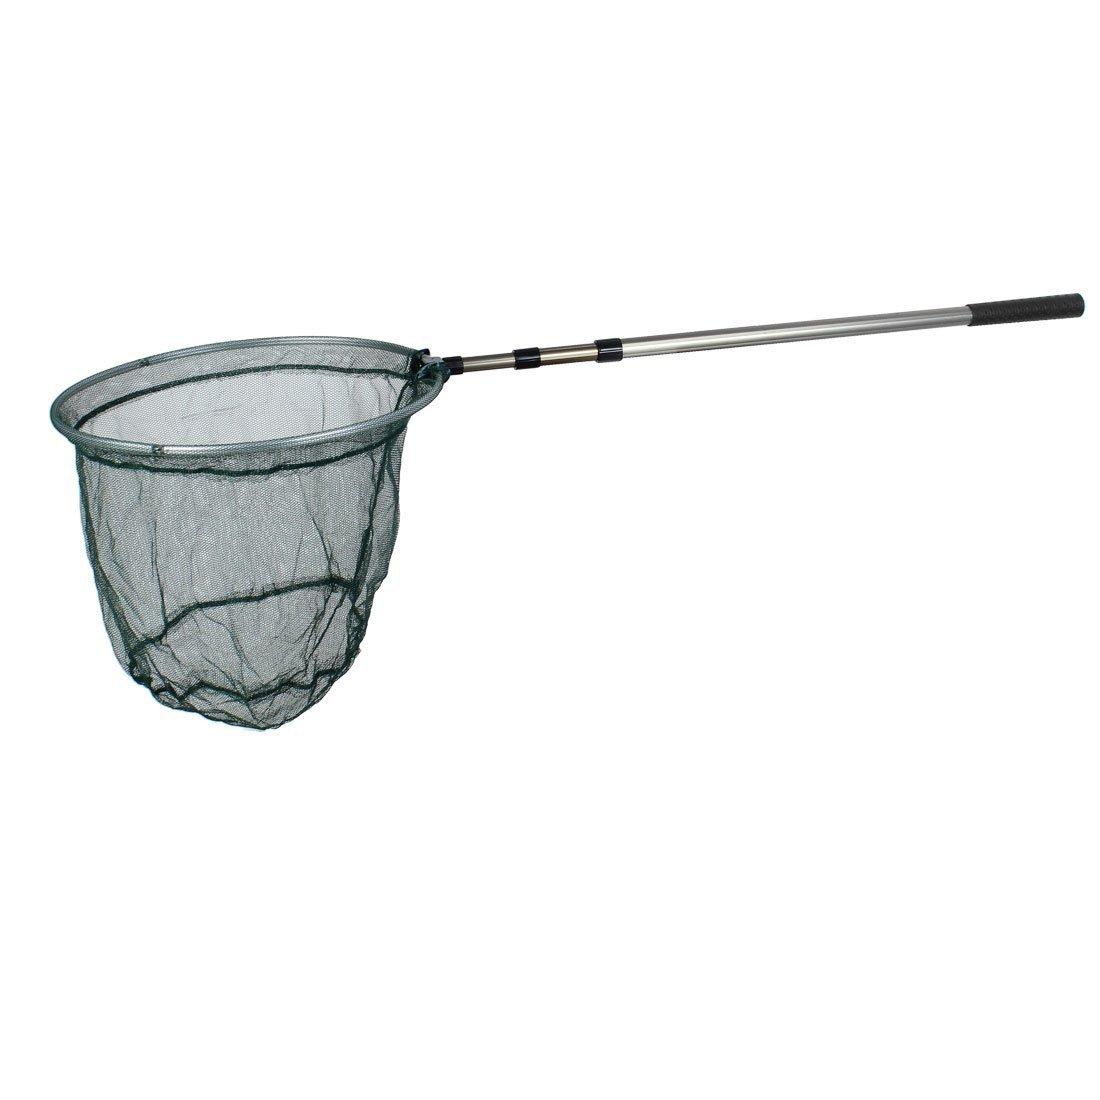 WCKJT 1.5M Metal Telescoping Foldable 2 Sections Fishing Net Fish Landing Net, Durable Nylon Material Mesh, Safe Fish Catching or Releasing